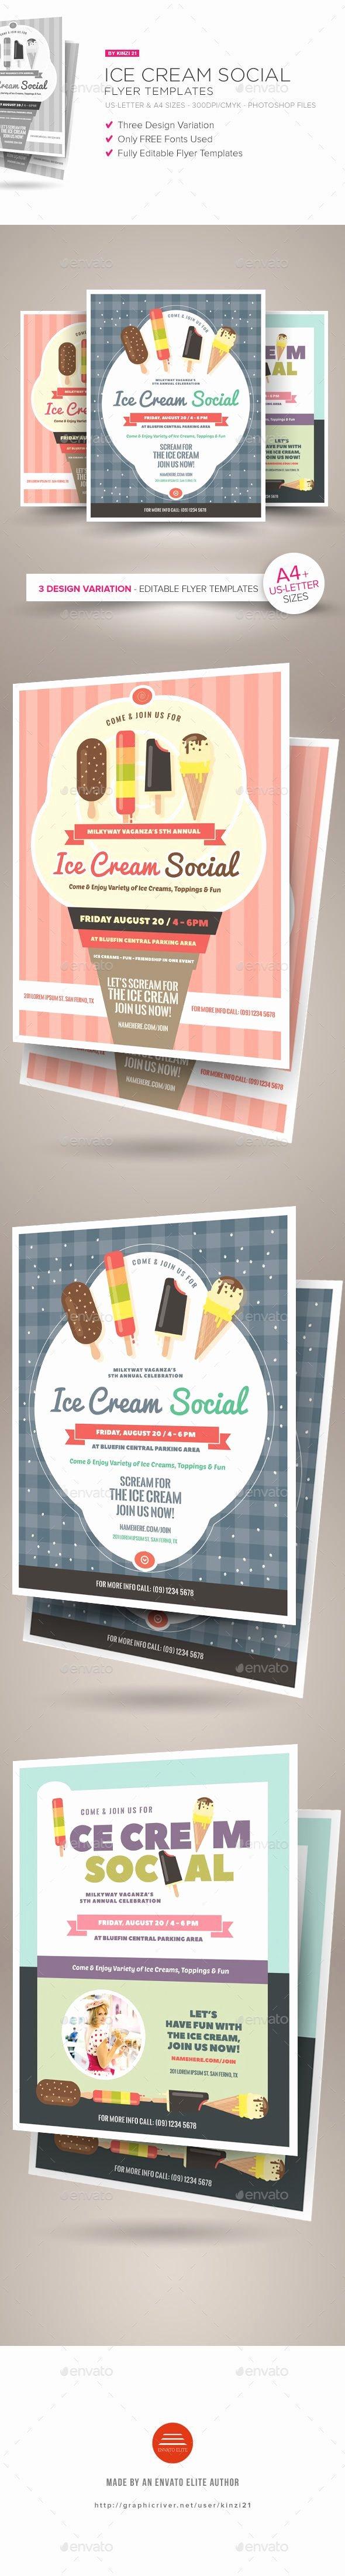 Ice Cream social Flyer Template Free Beautiful Ice Cream social Flyer Templates